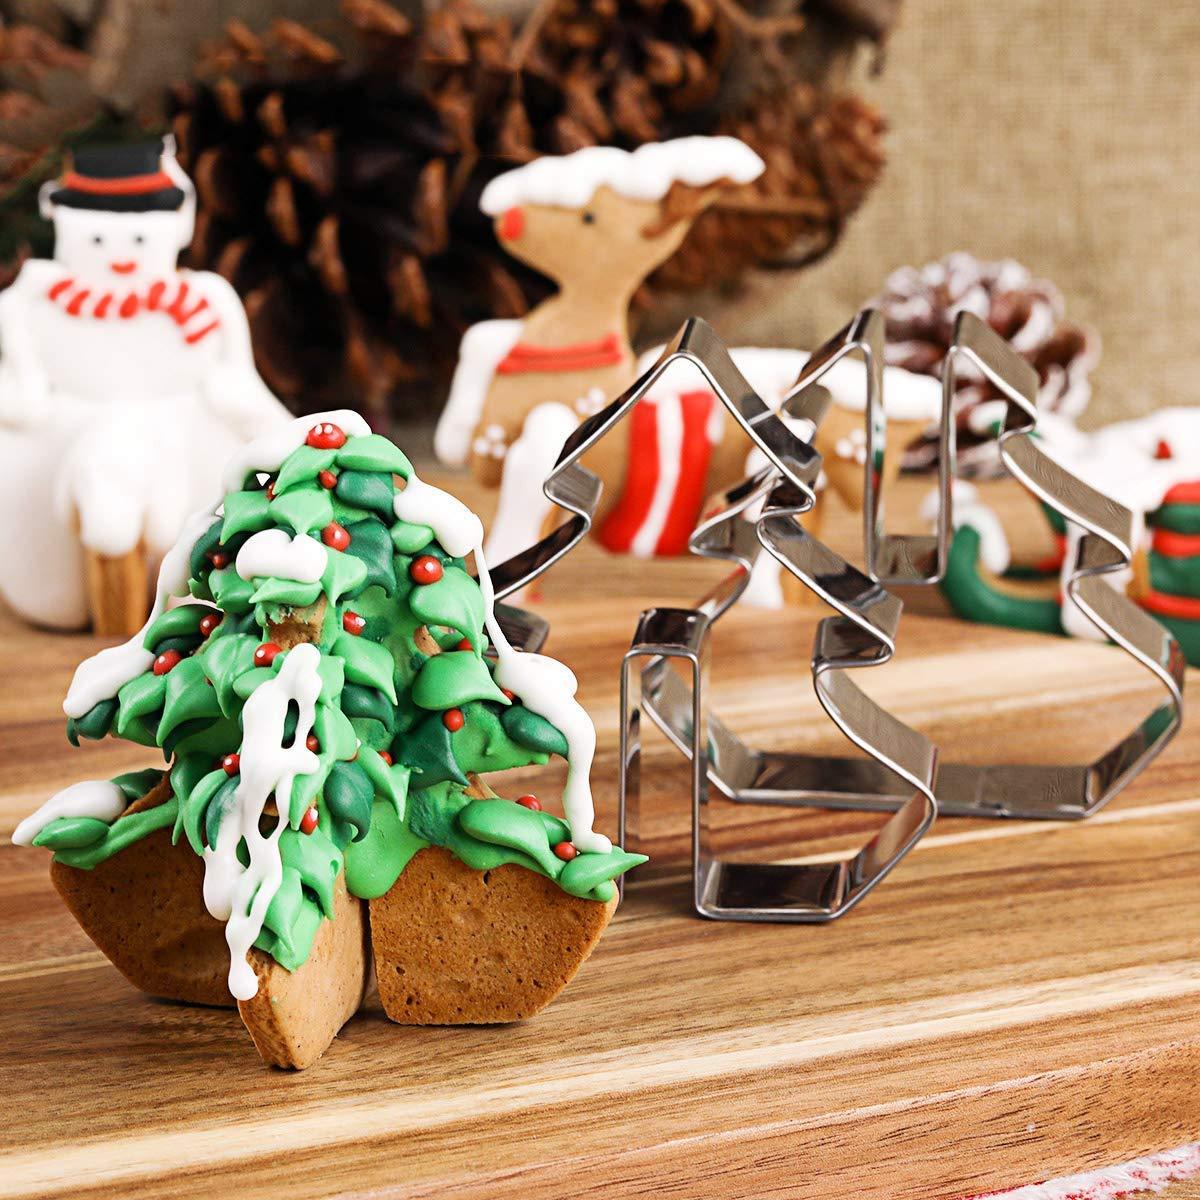 Biscotti Albero Di Natale 3d.Set Di 8 Formine Per Biscotti Di Natale 3d In Acciaio Inox Stampini Per Biscotti Fatti In Casa Per Bambini Motivi Albero Di Natale Pupazzo Di